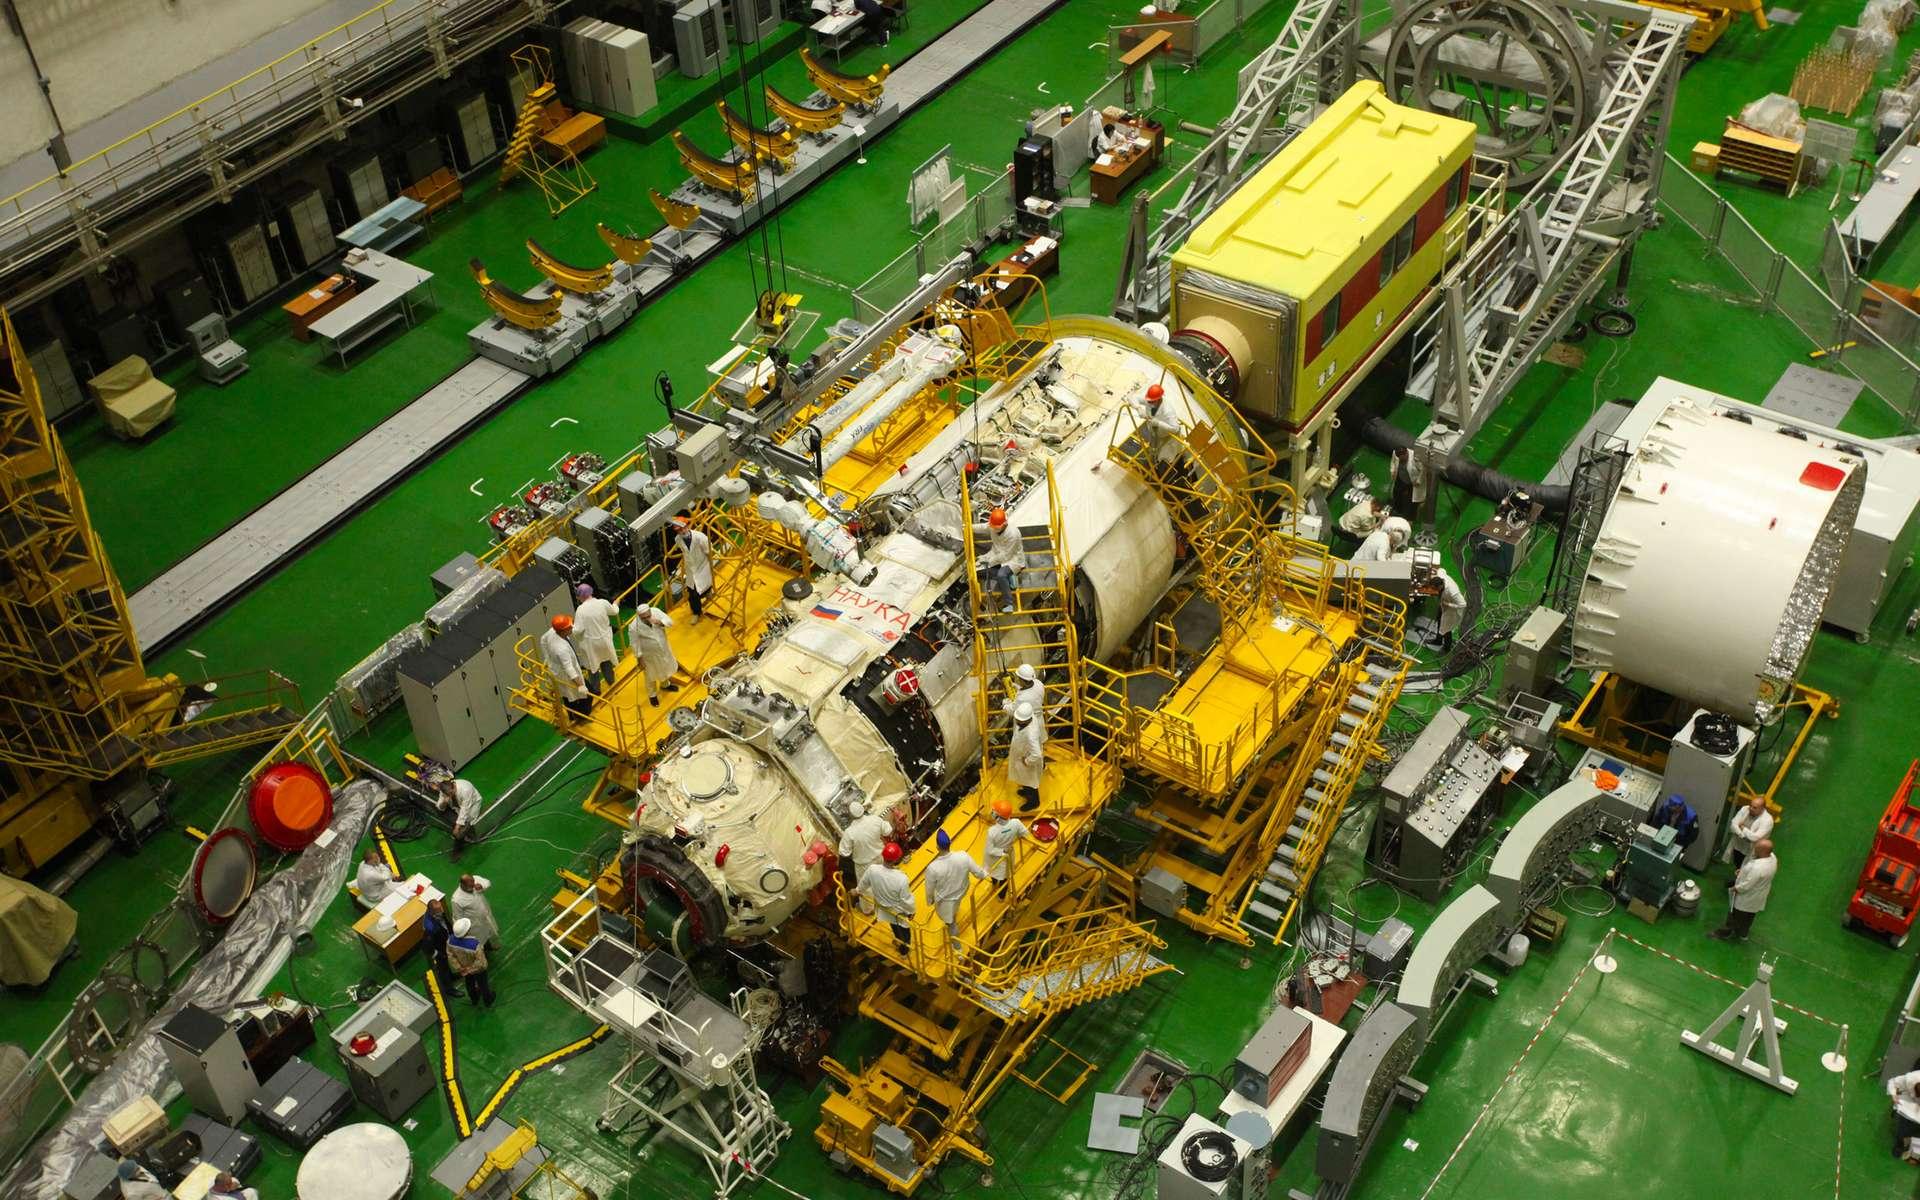 Installation du bras robotique européen ERA sur le module russe Nauka. © Roscosmos